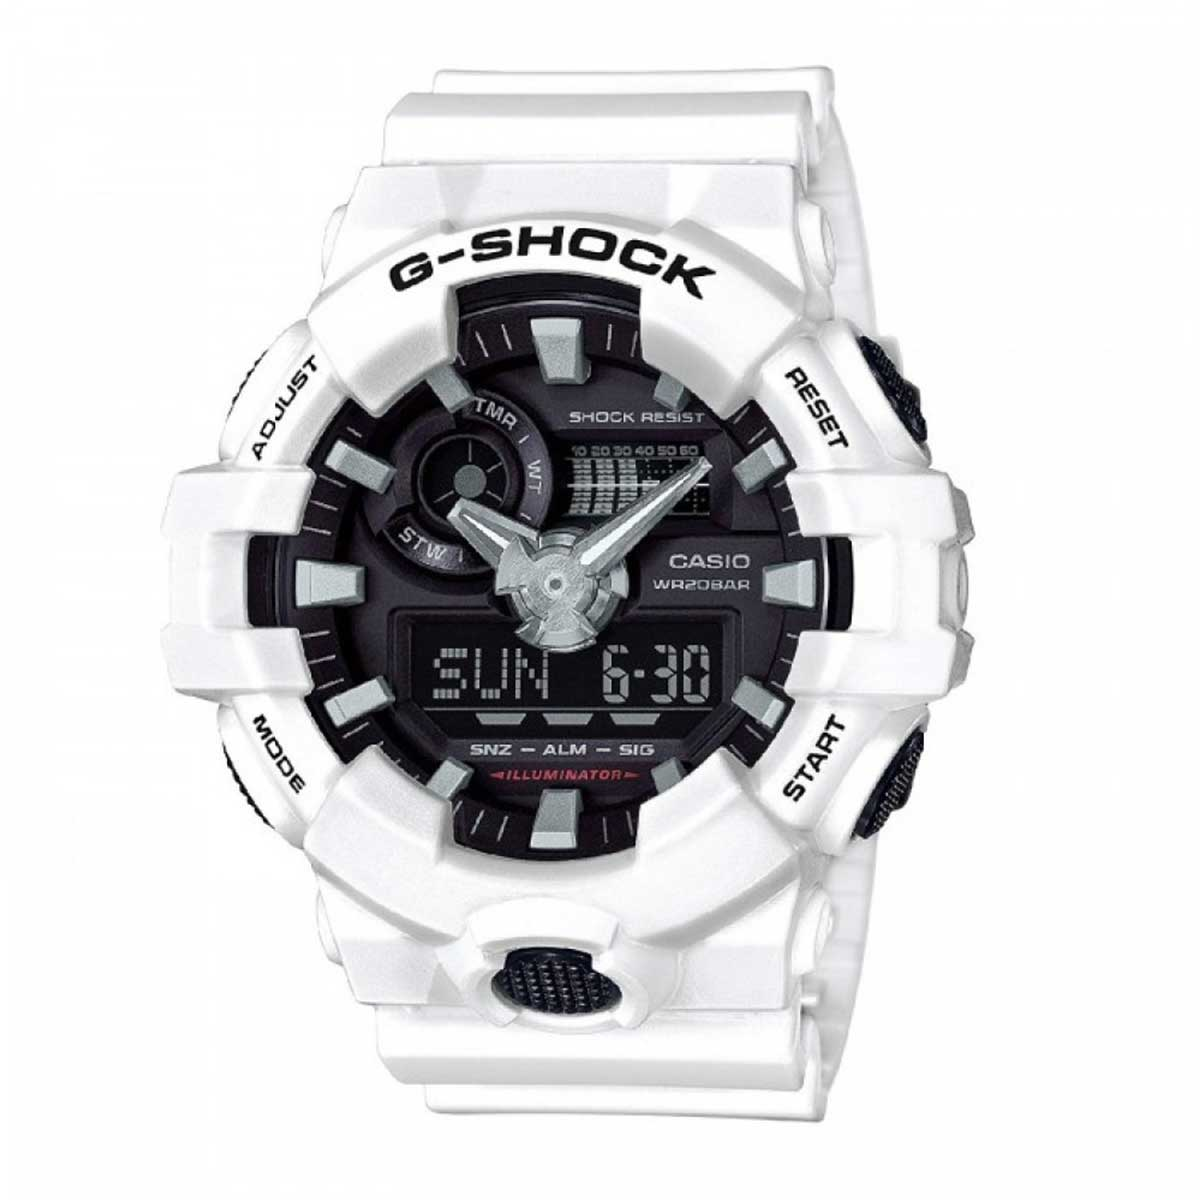 Relógio de Pulso Casio G-ShocK Branco Modelo GA-700-7ADR